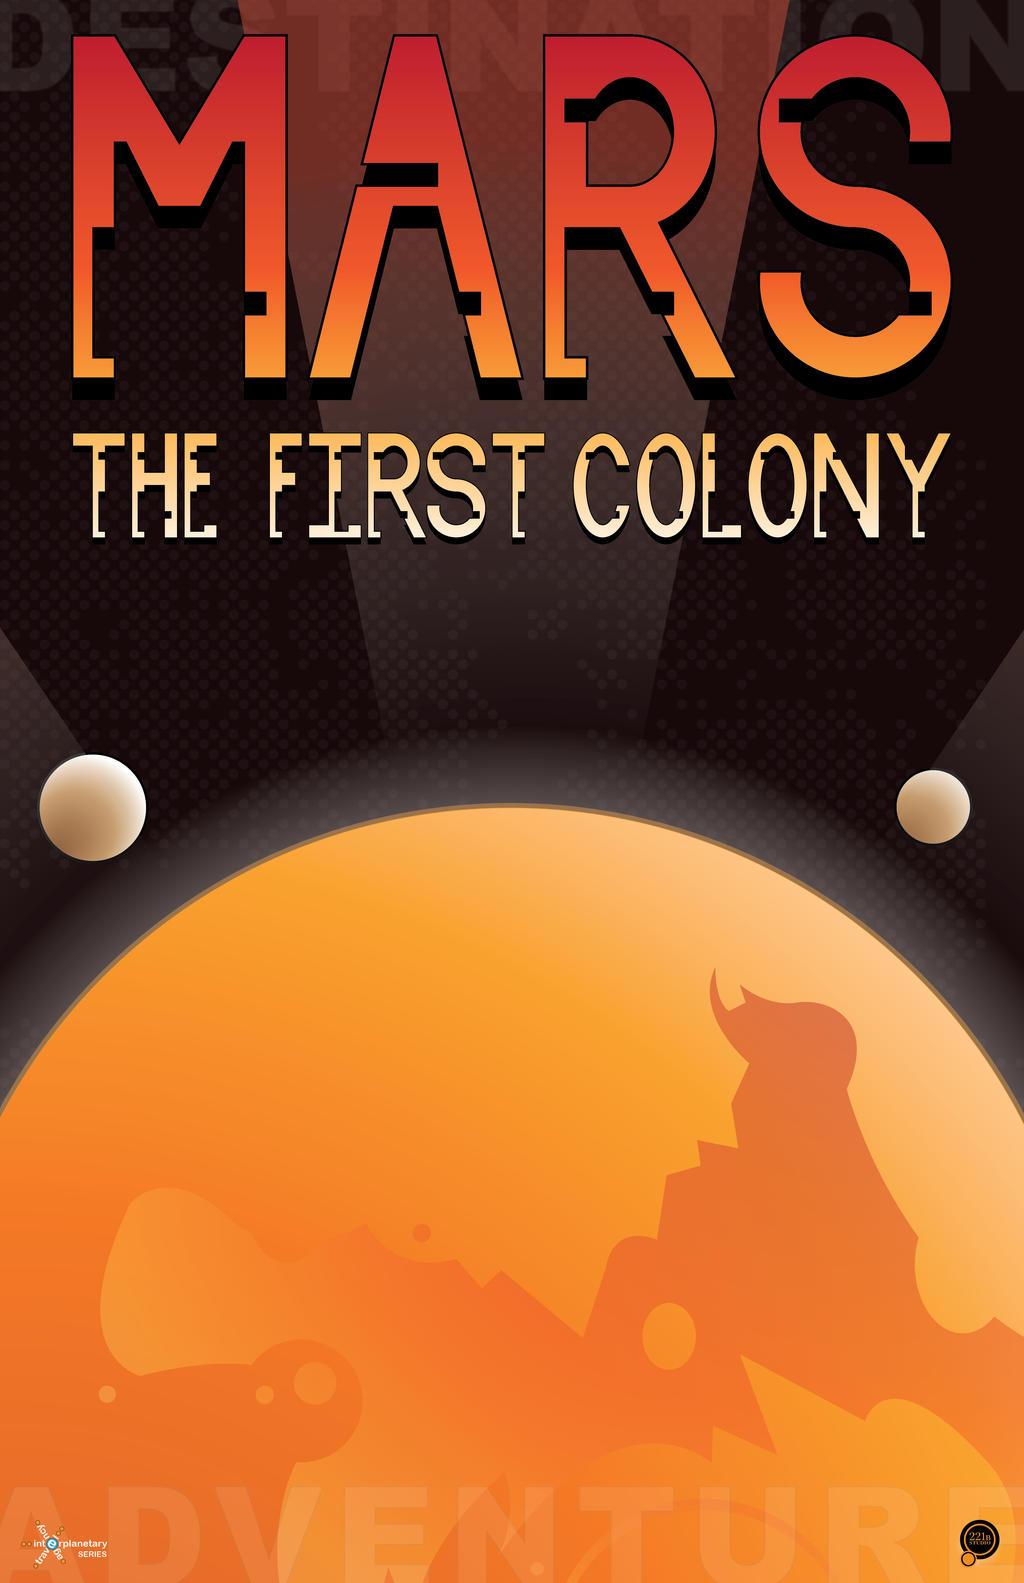 Interplanetary Travel Agency- Mars